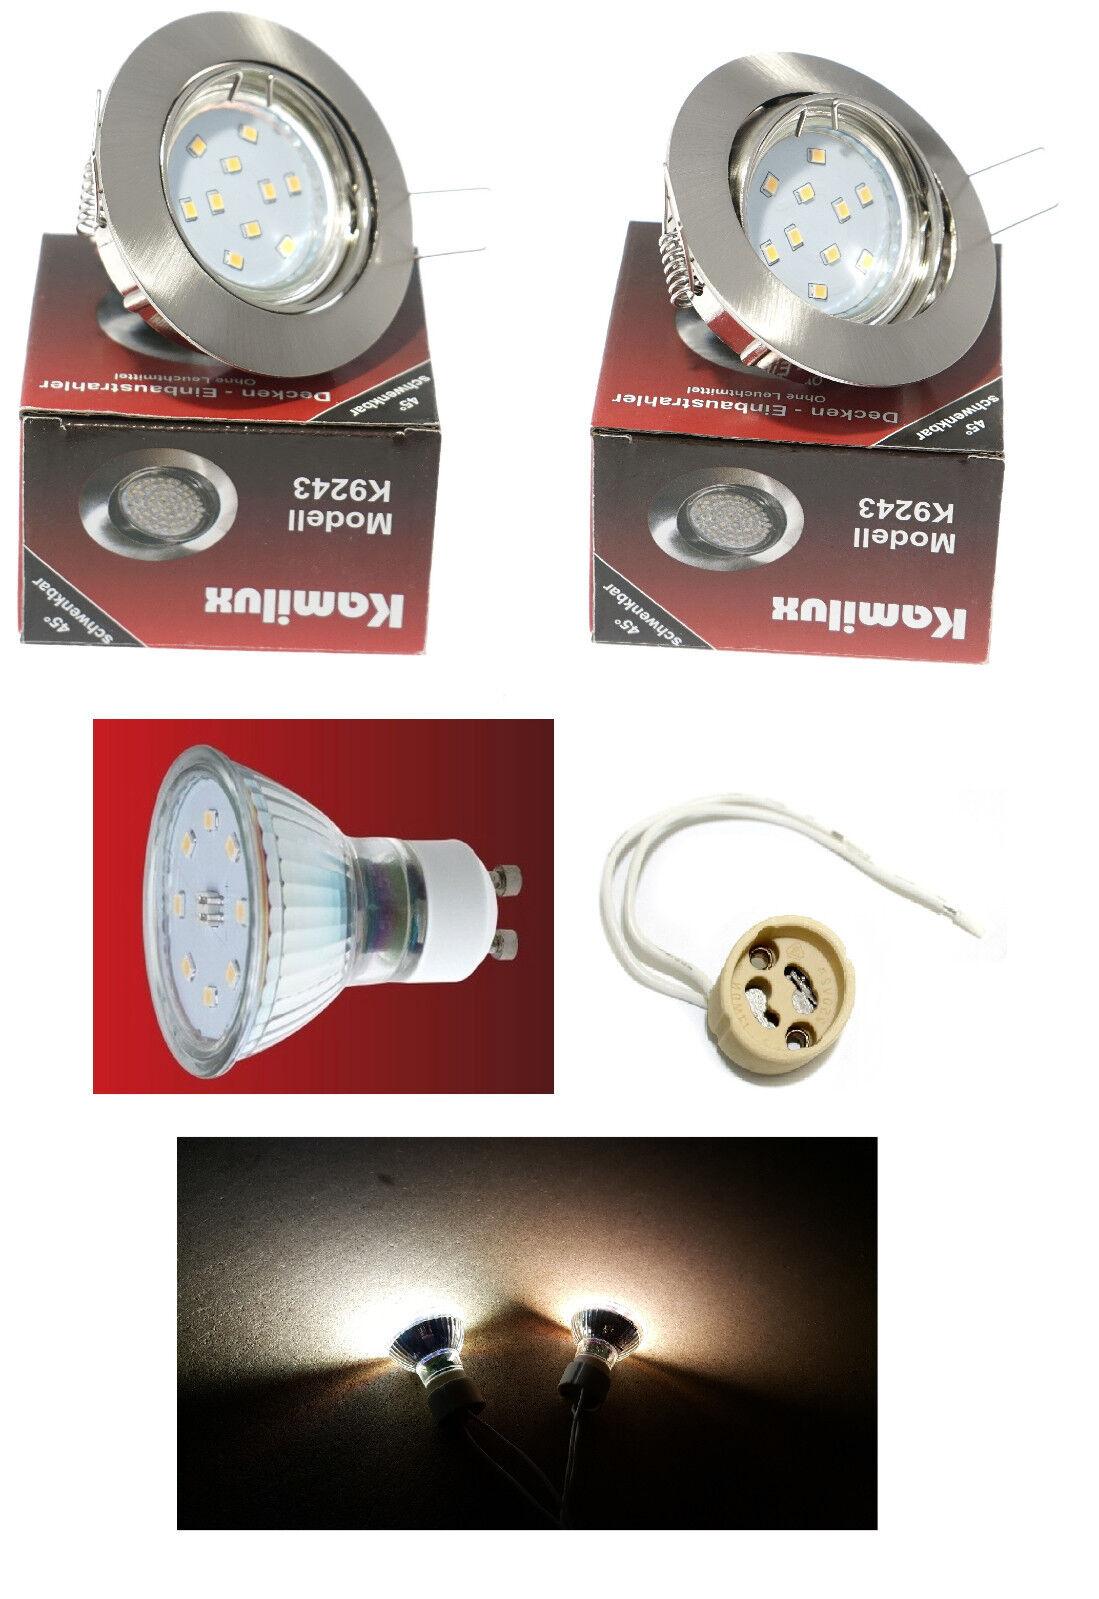 SMD LED Einbaustrahler Set Lisa Edelstahl geb 5W = 50W schwenkbar 230V IP20 GU10